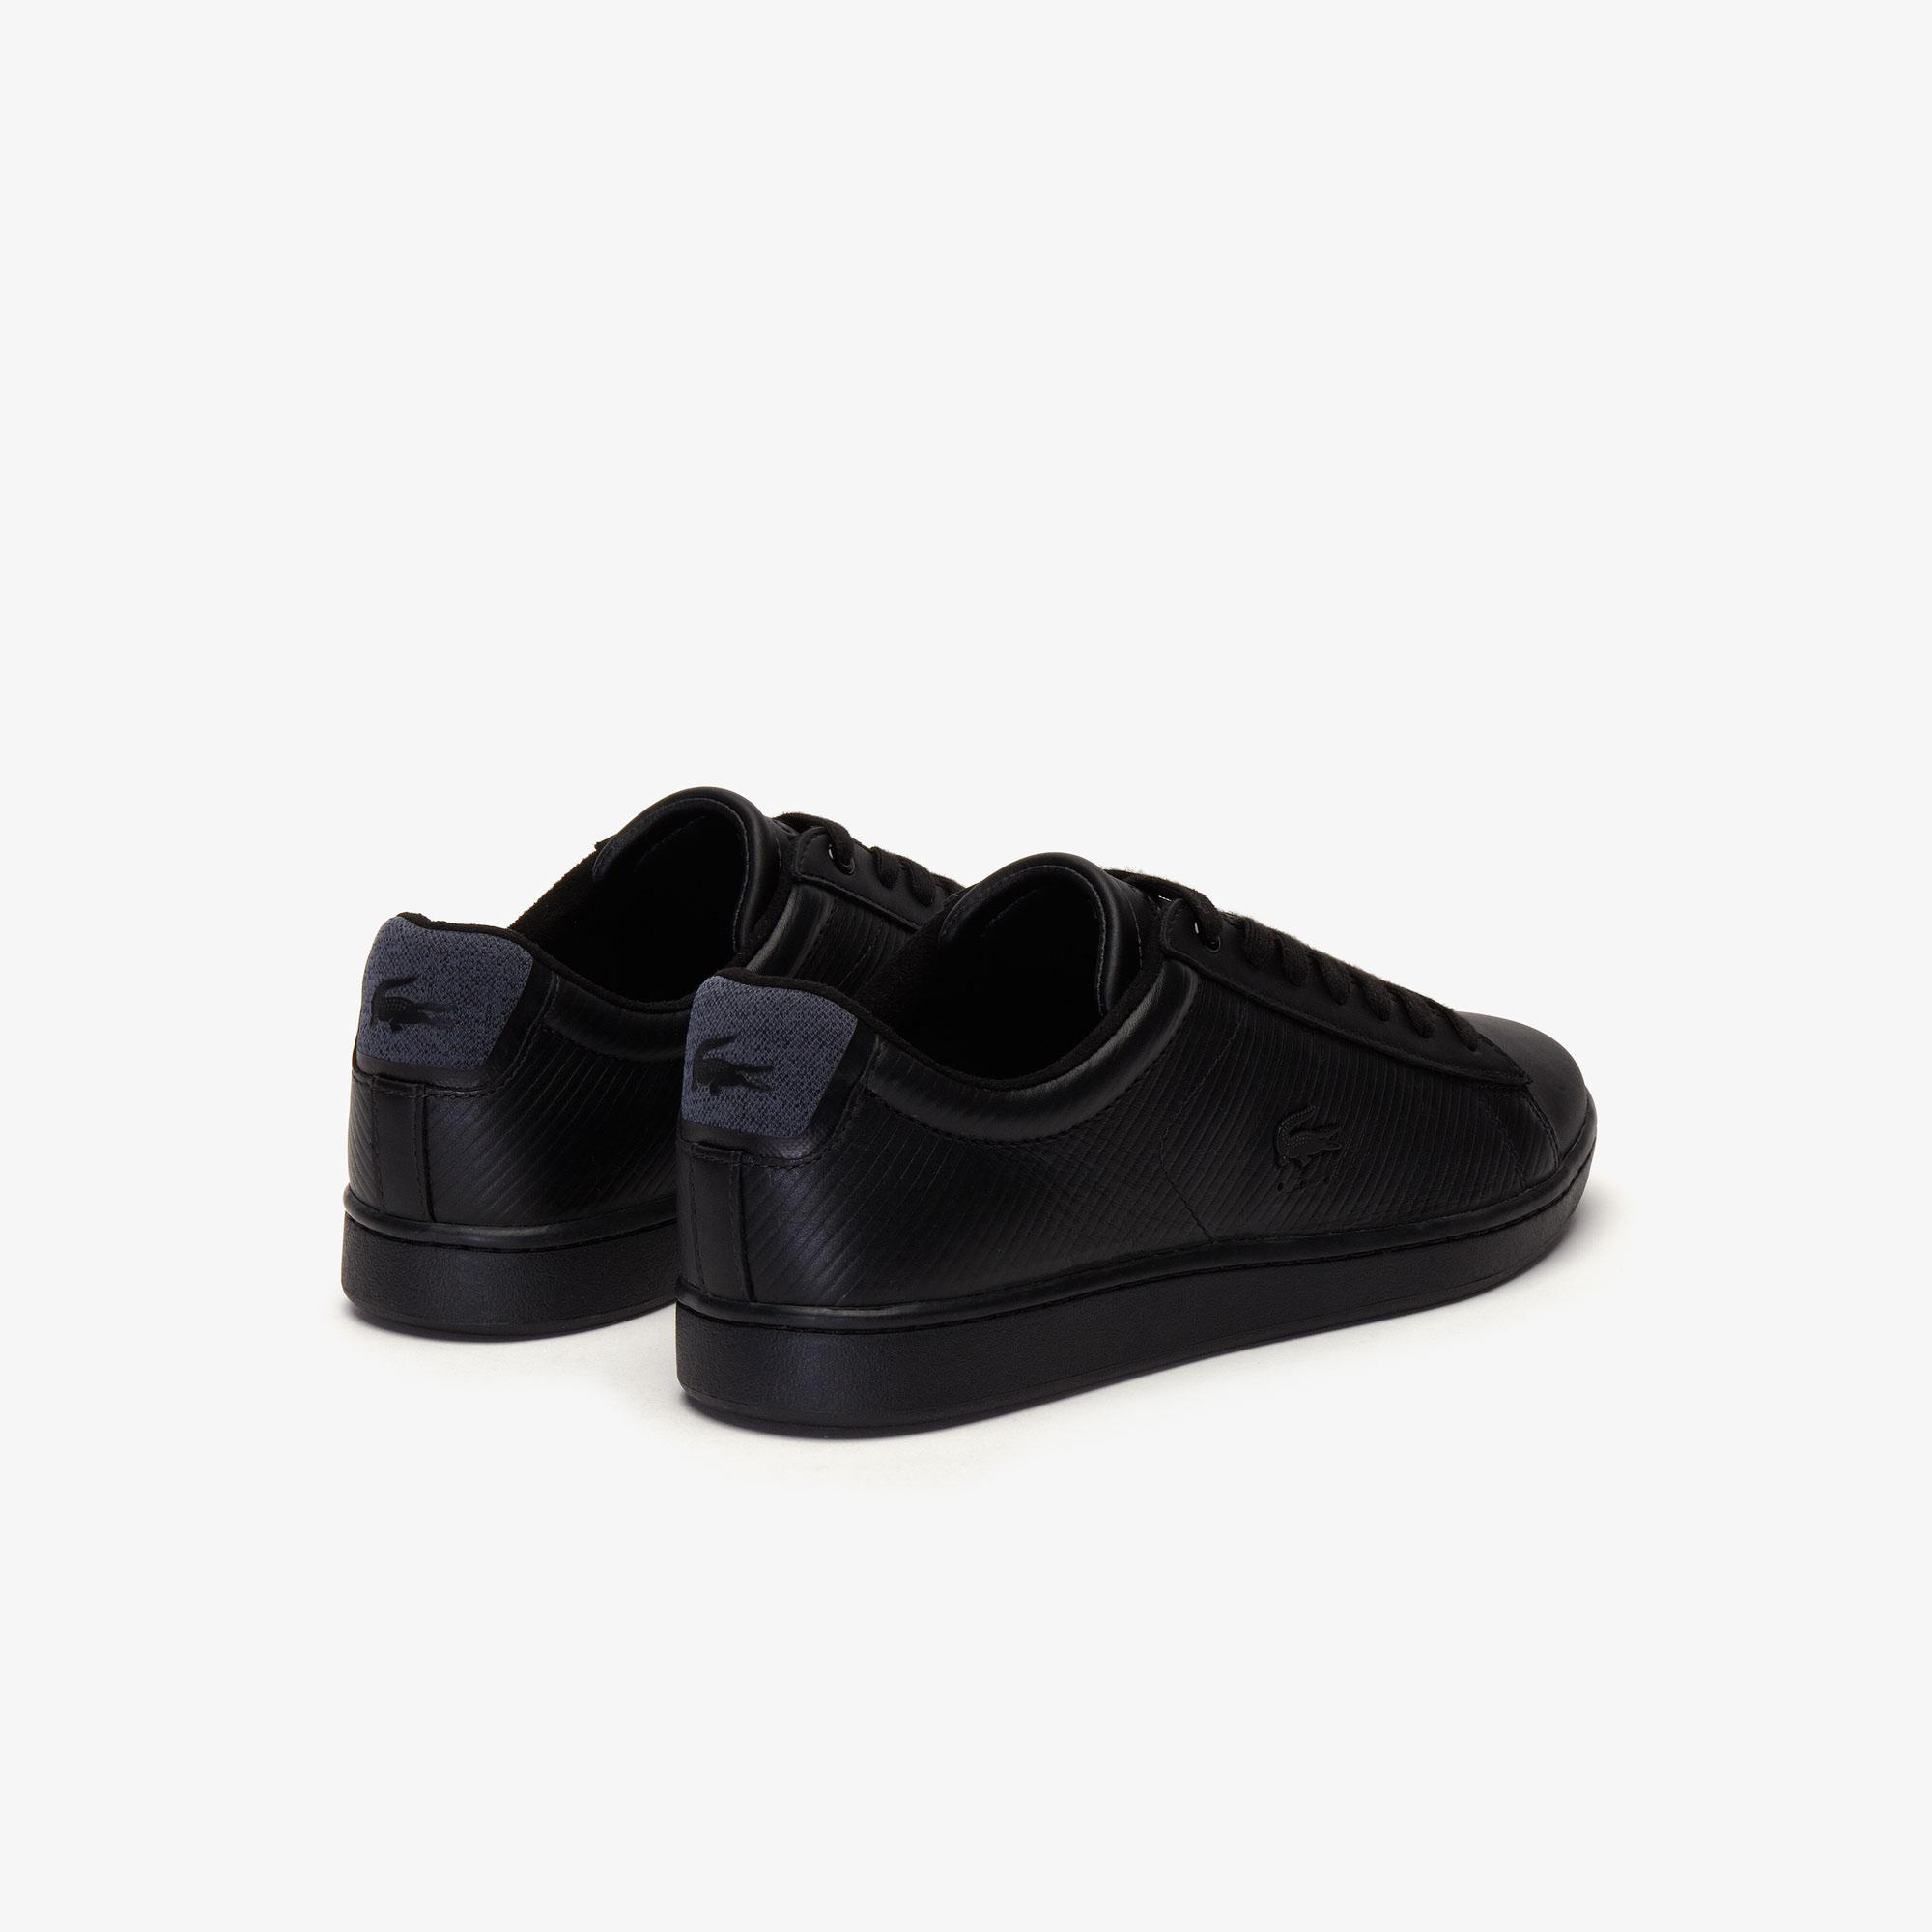 Lacoste Carnaby Evo 319 9 Męskie Sneakersy